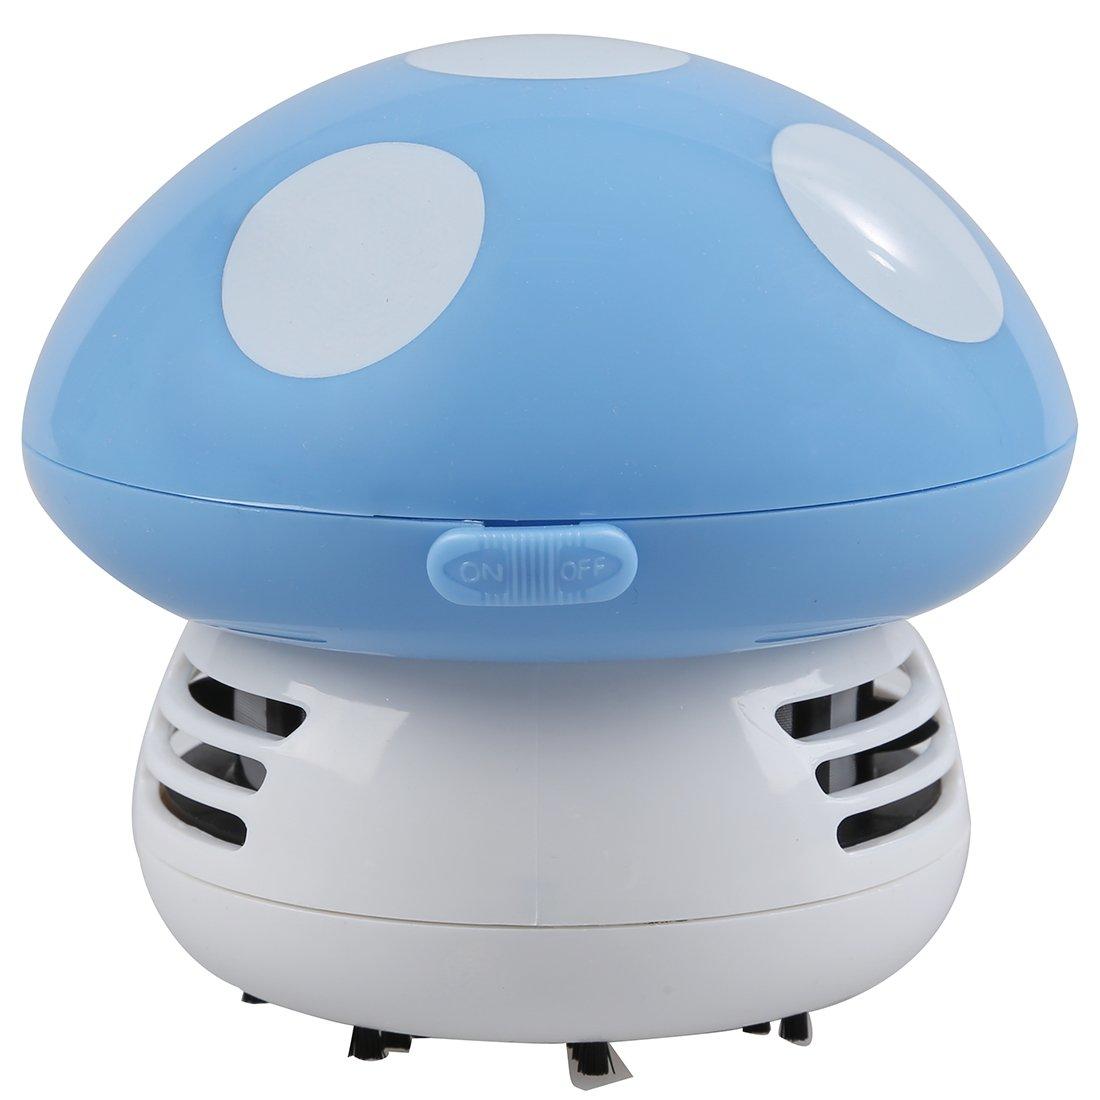 Wall of Dragon New Home Handheld Mushroom Shaped Mini Vacuum Cleaner Car Laptop keyboard Desktop Dust cleaner-blue